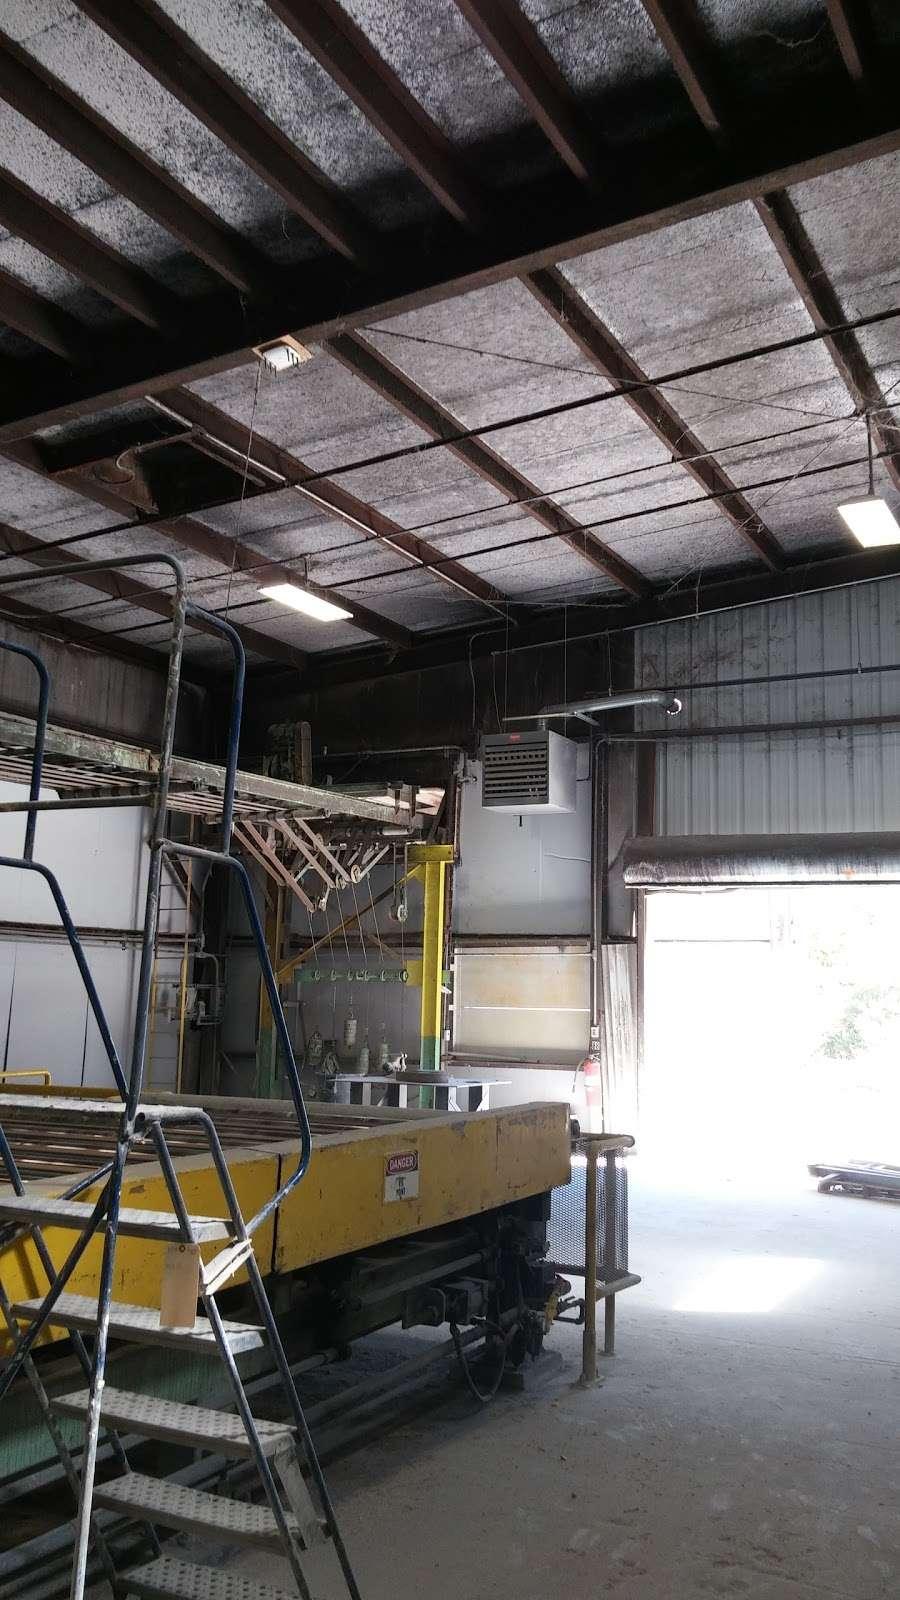 National Gypsum Co - hardware store  | Photo 3 of 5 | Address: 1818 River Rd, Burlington, NJ 08016, USA | Phone: (609) 499-3300